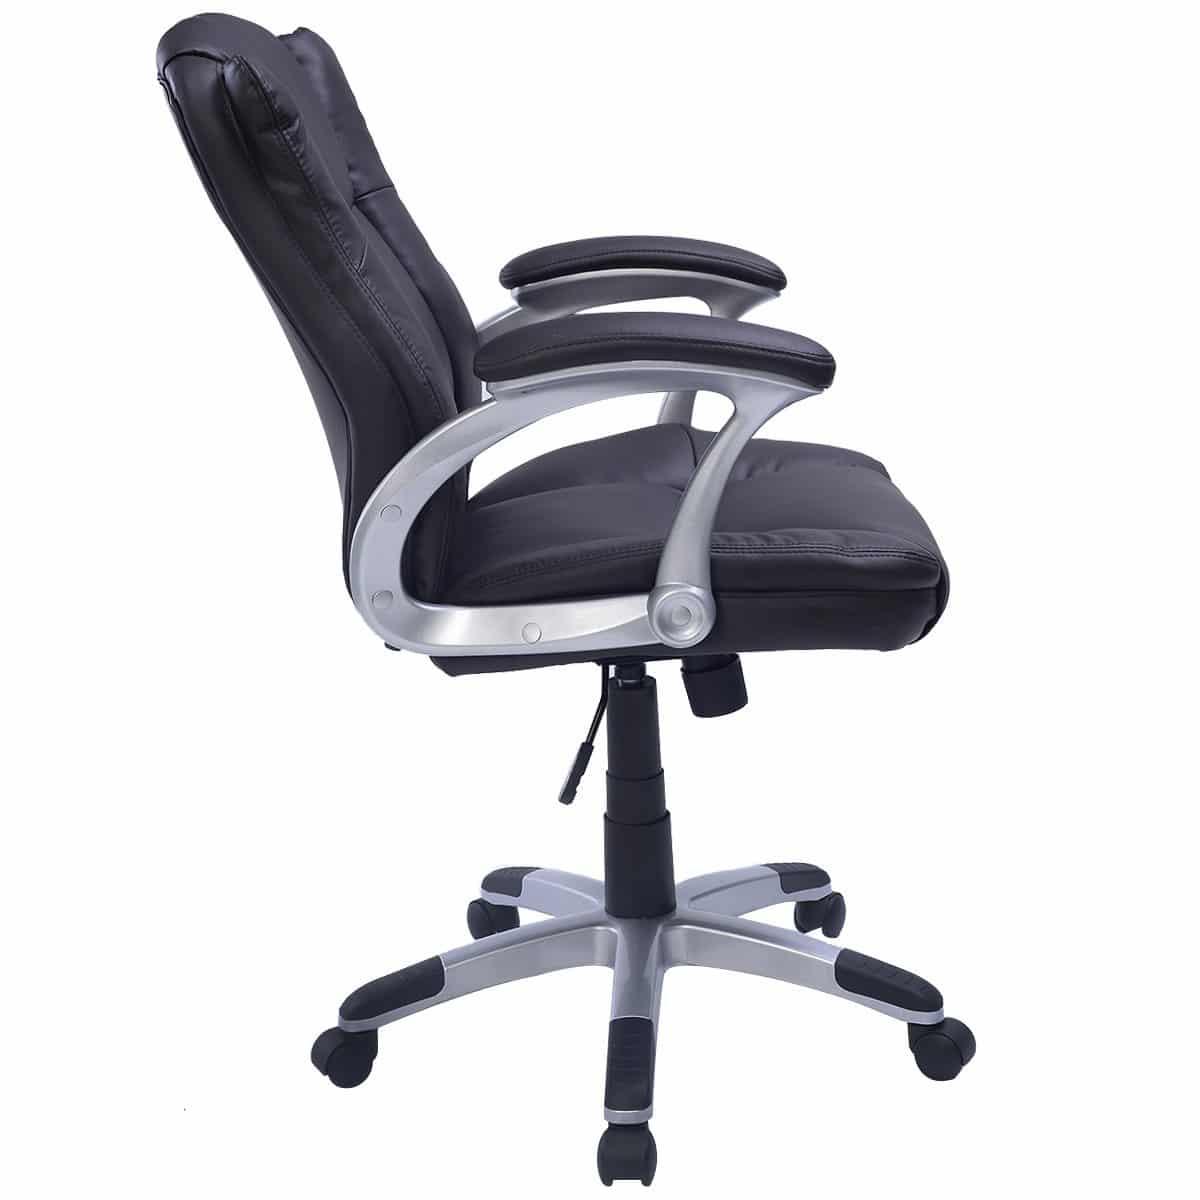 Chefsessel Bürostuhl im Test